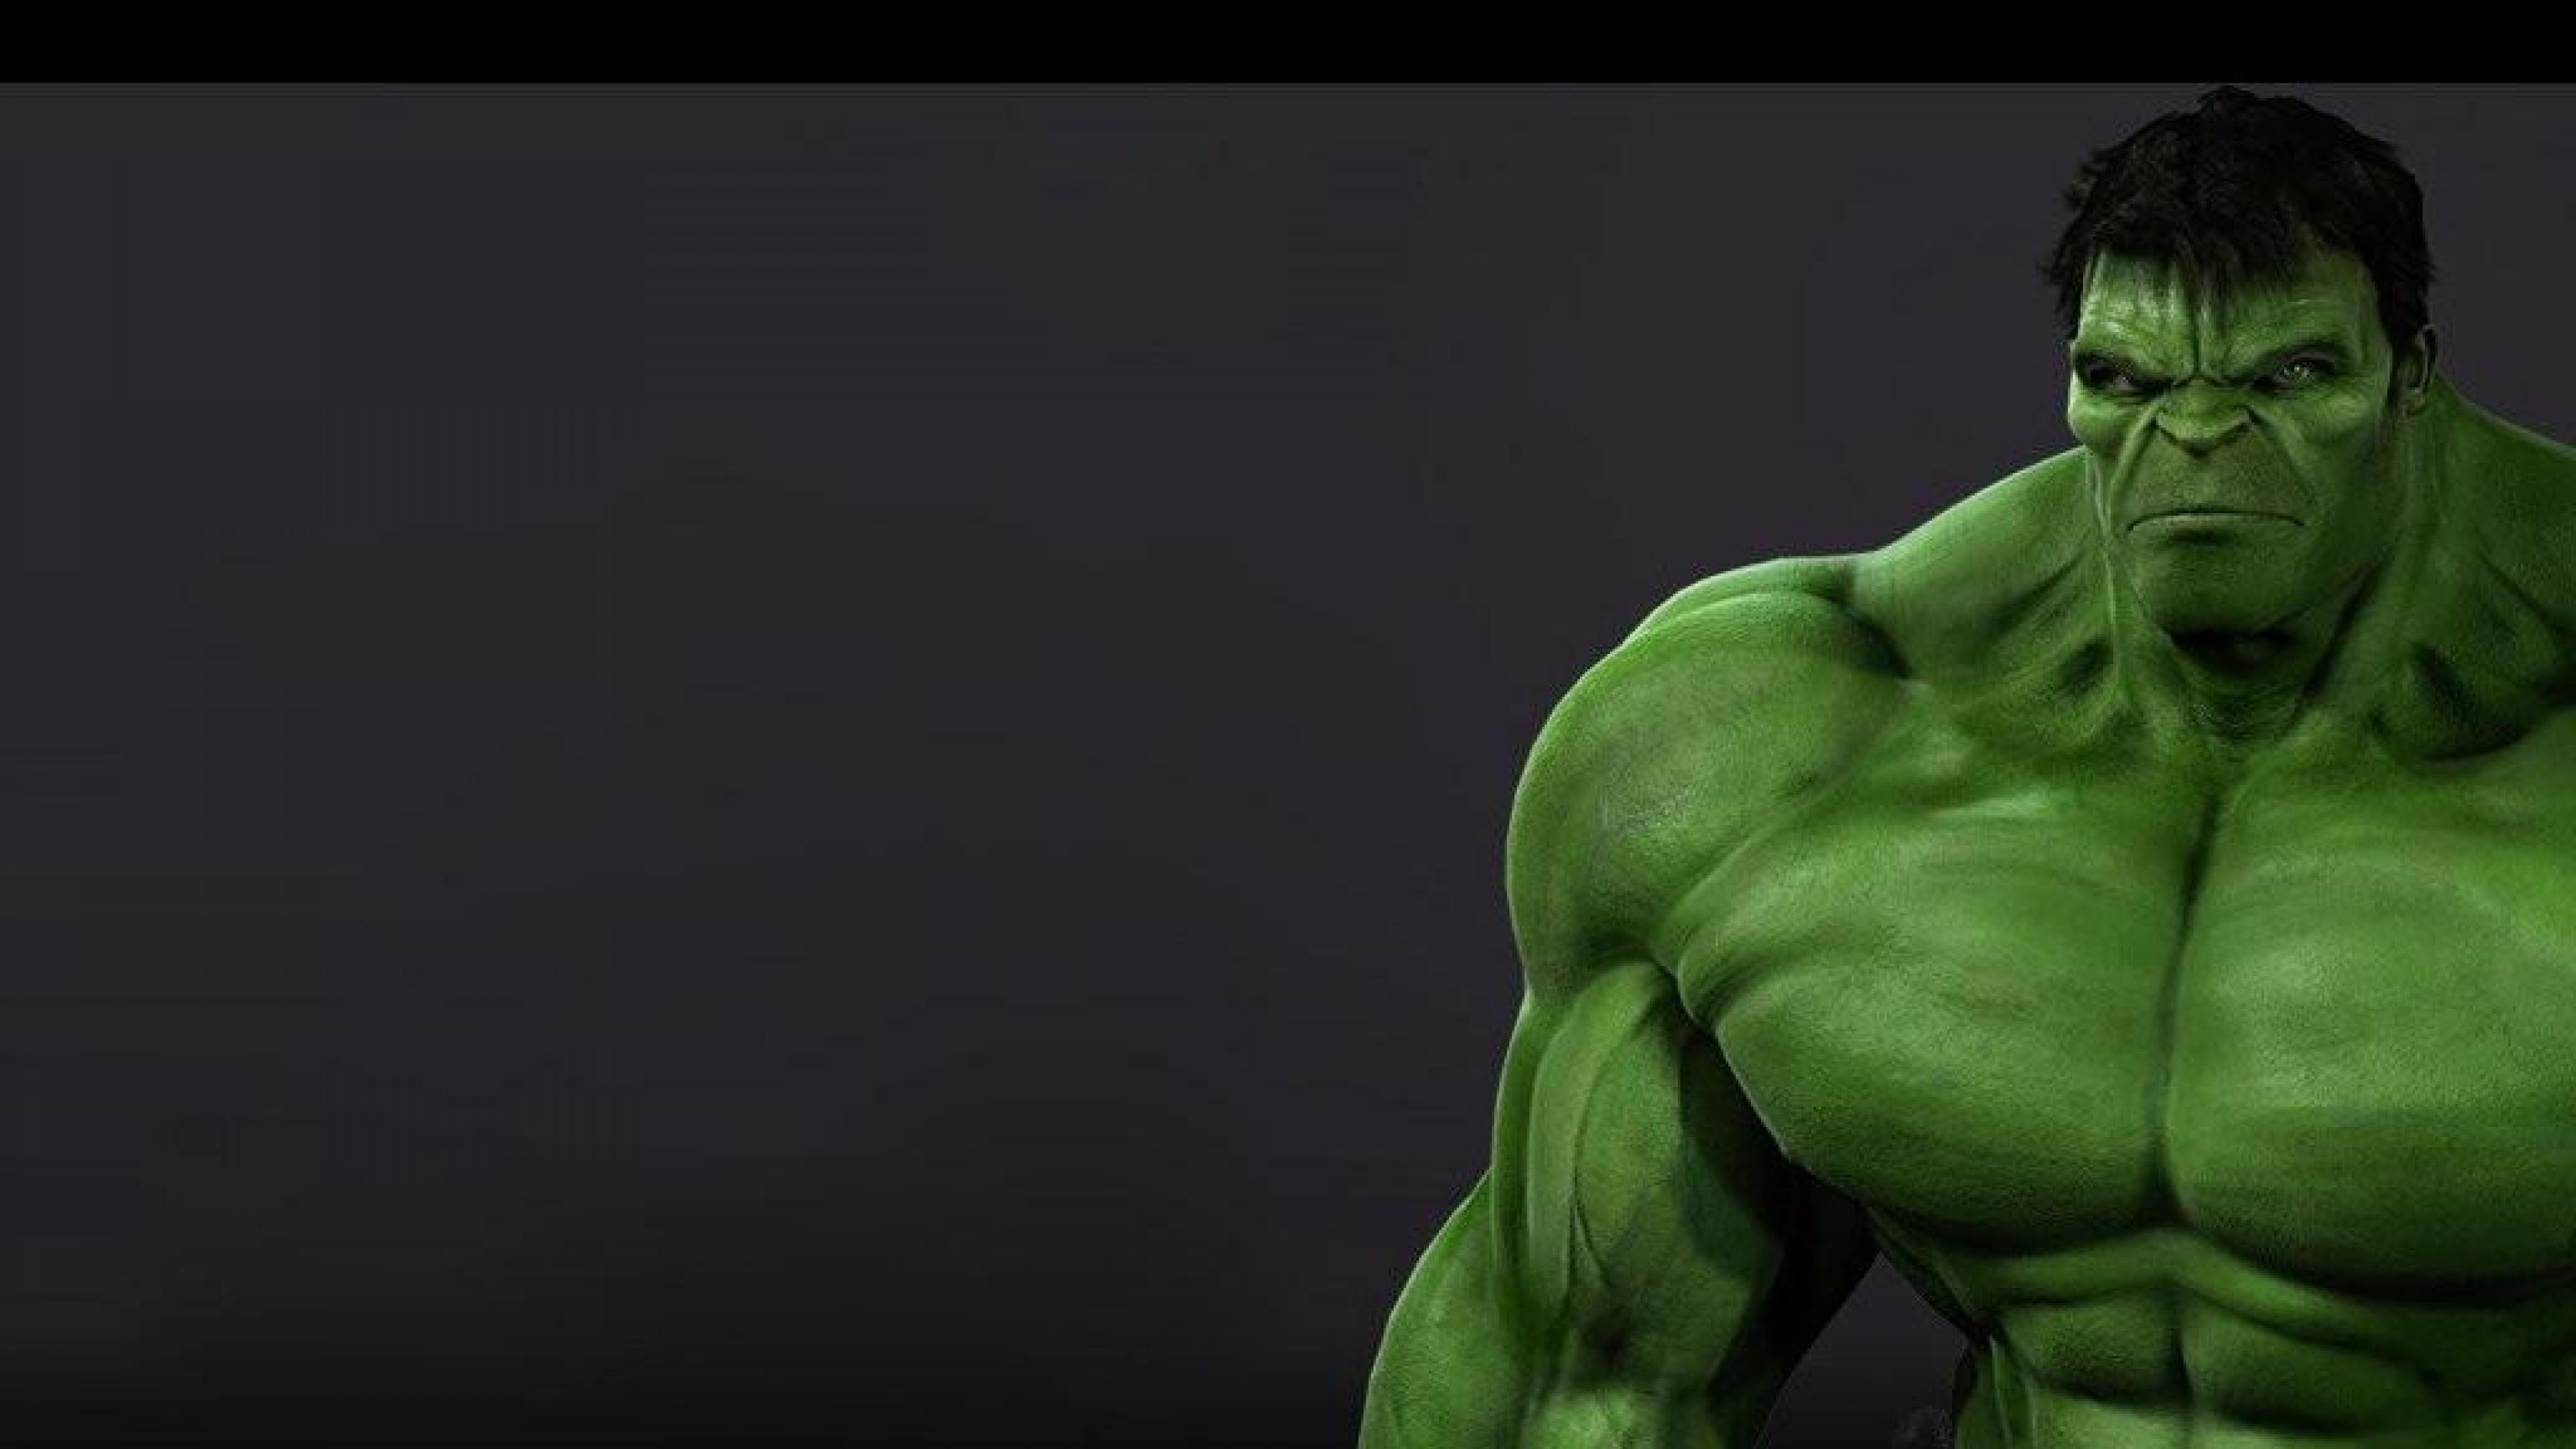 Hulk HD Wallpapers Desktop Backgrounds Mobile Wallpapers 3840x2160